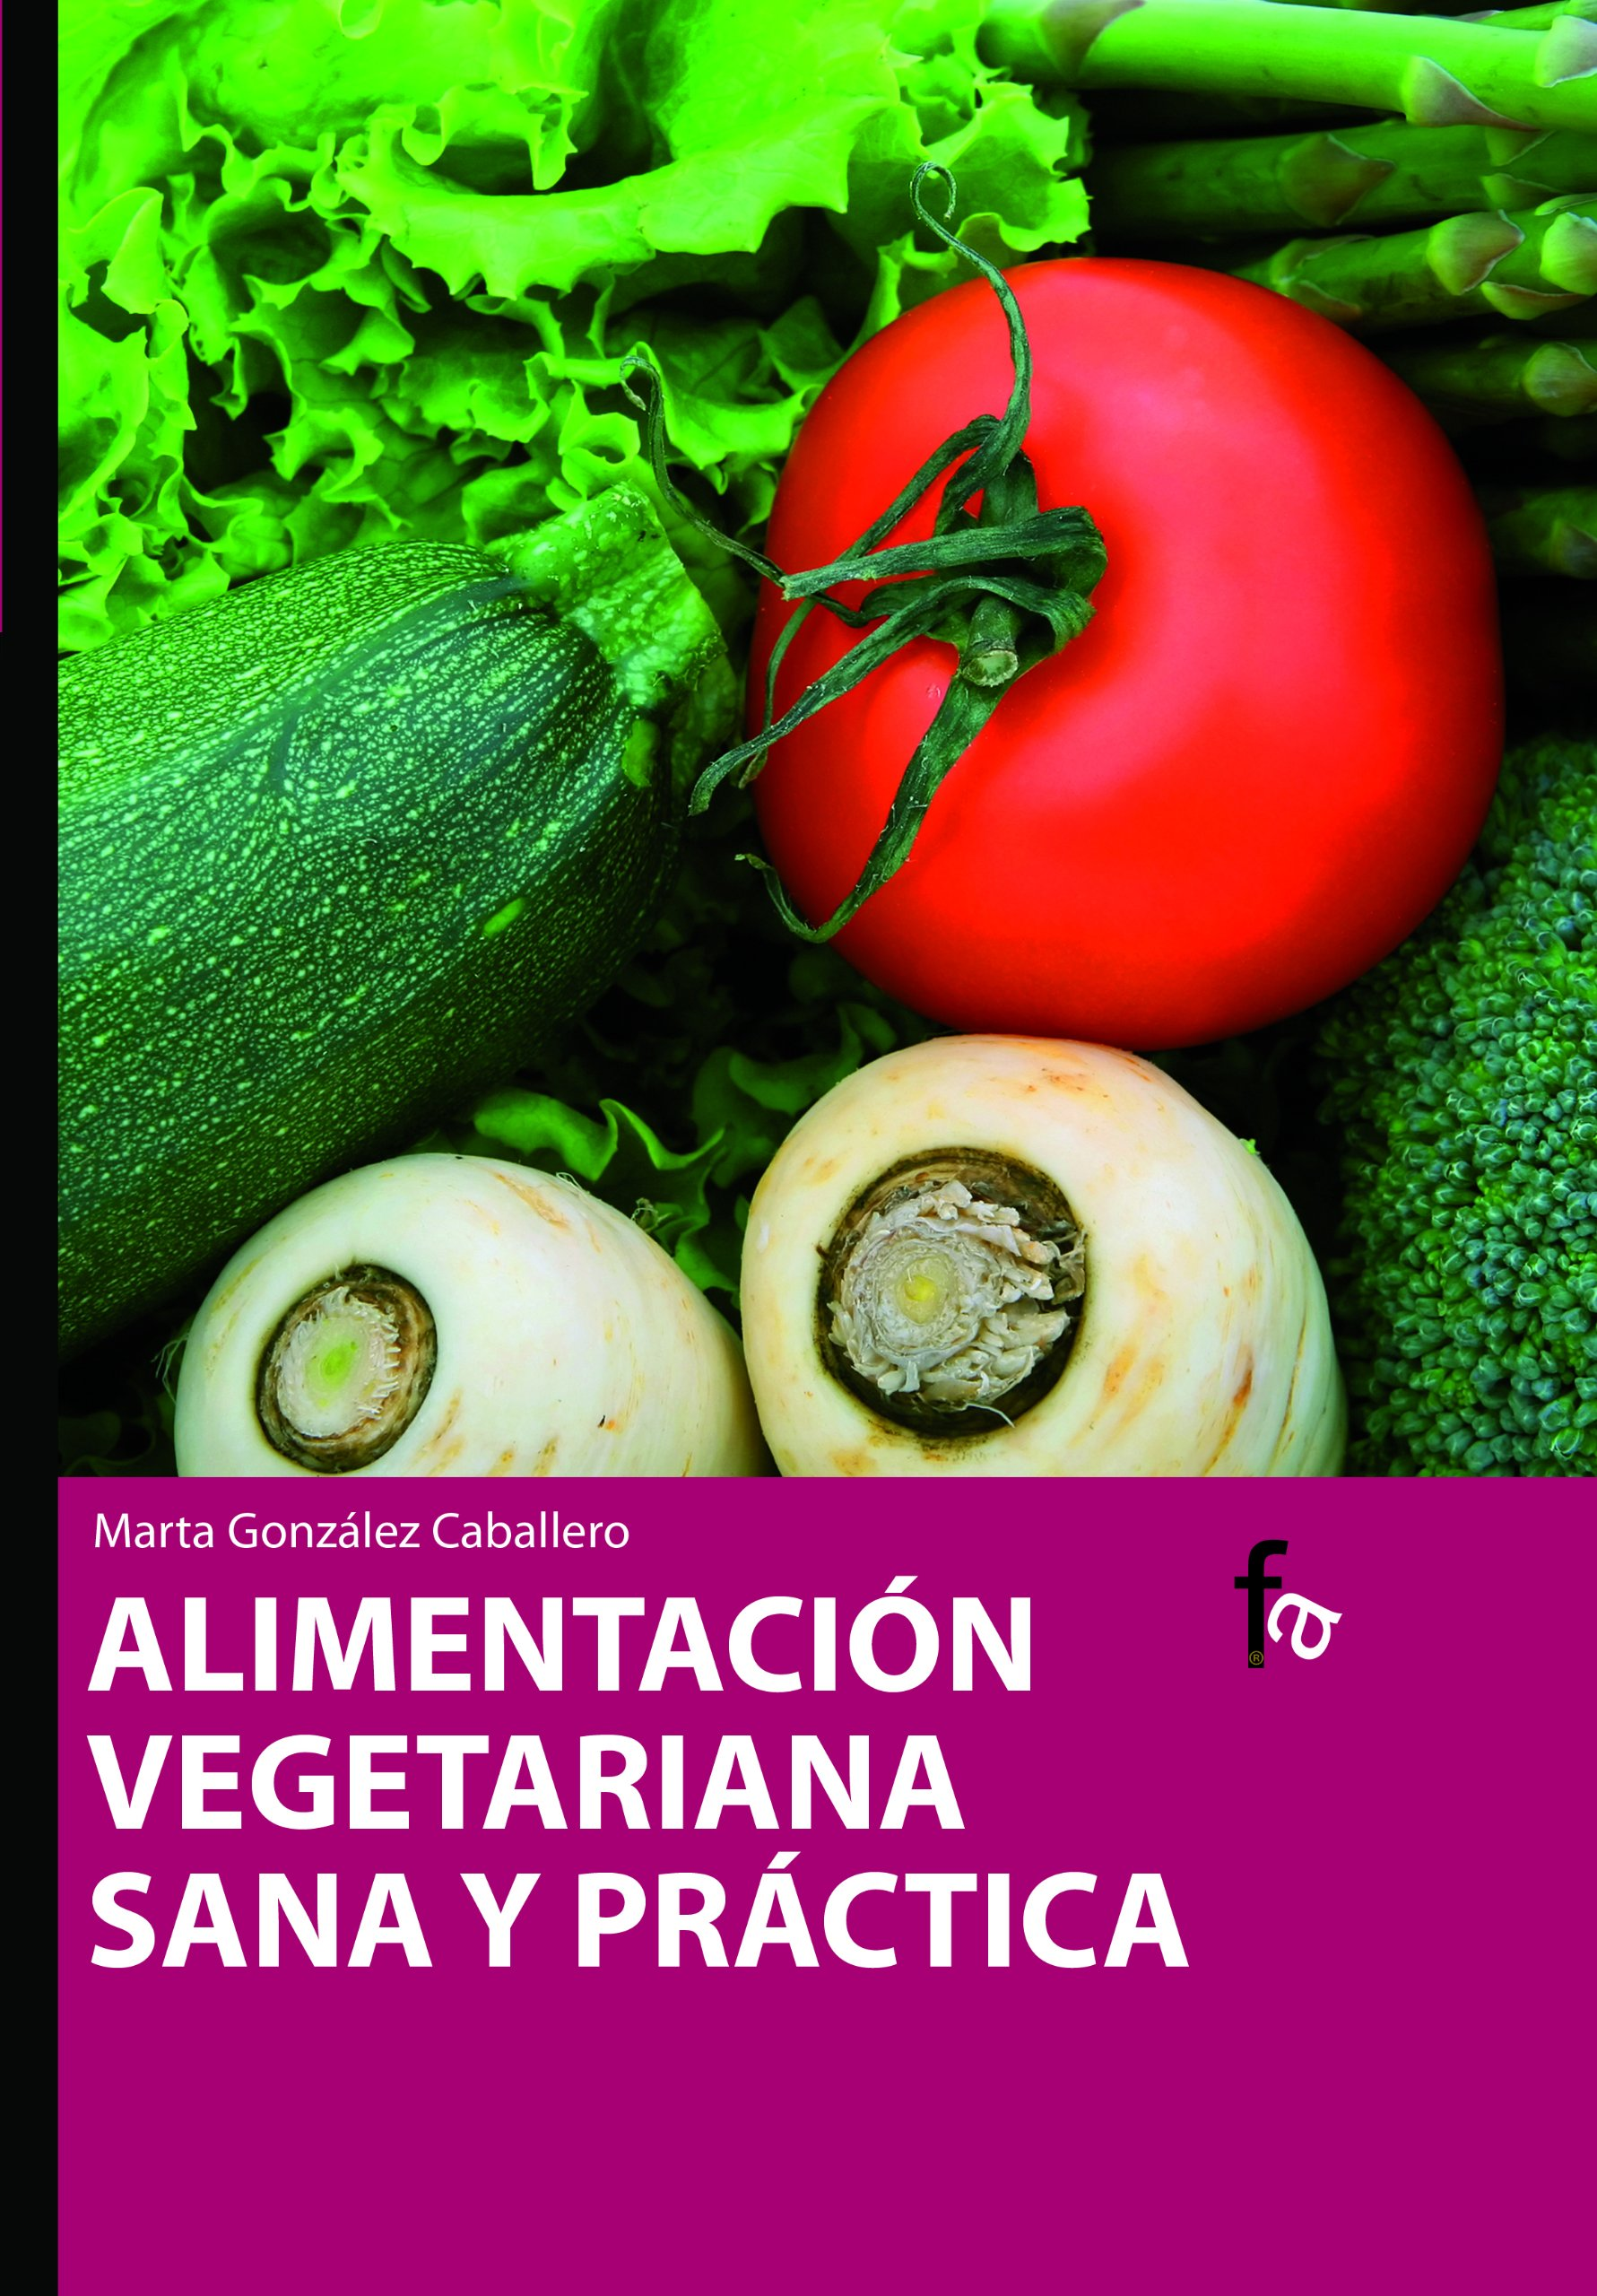 Alimentacion vegetariana sana y practa (Spanish Edition) (Spanish) Hardcover – July 20, 2009